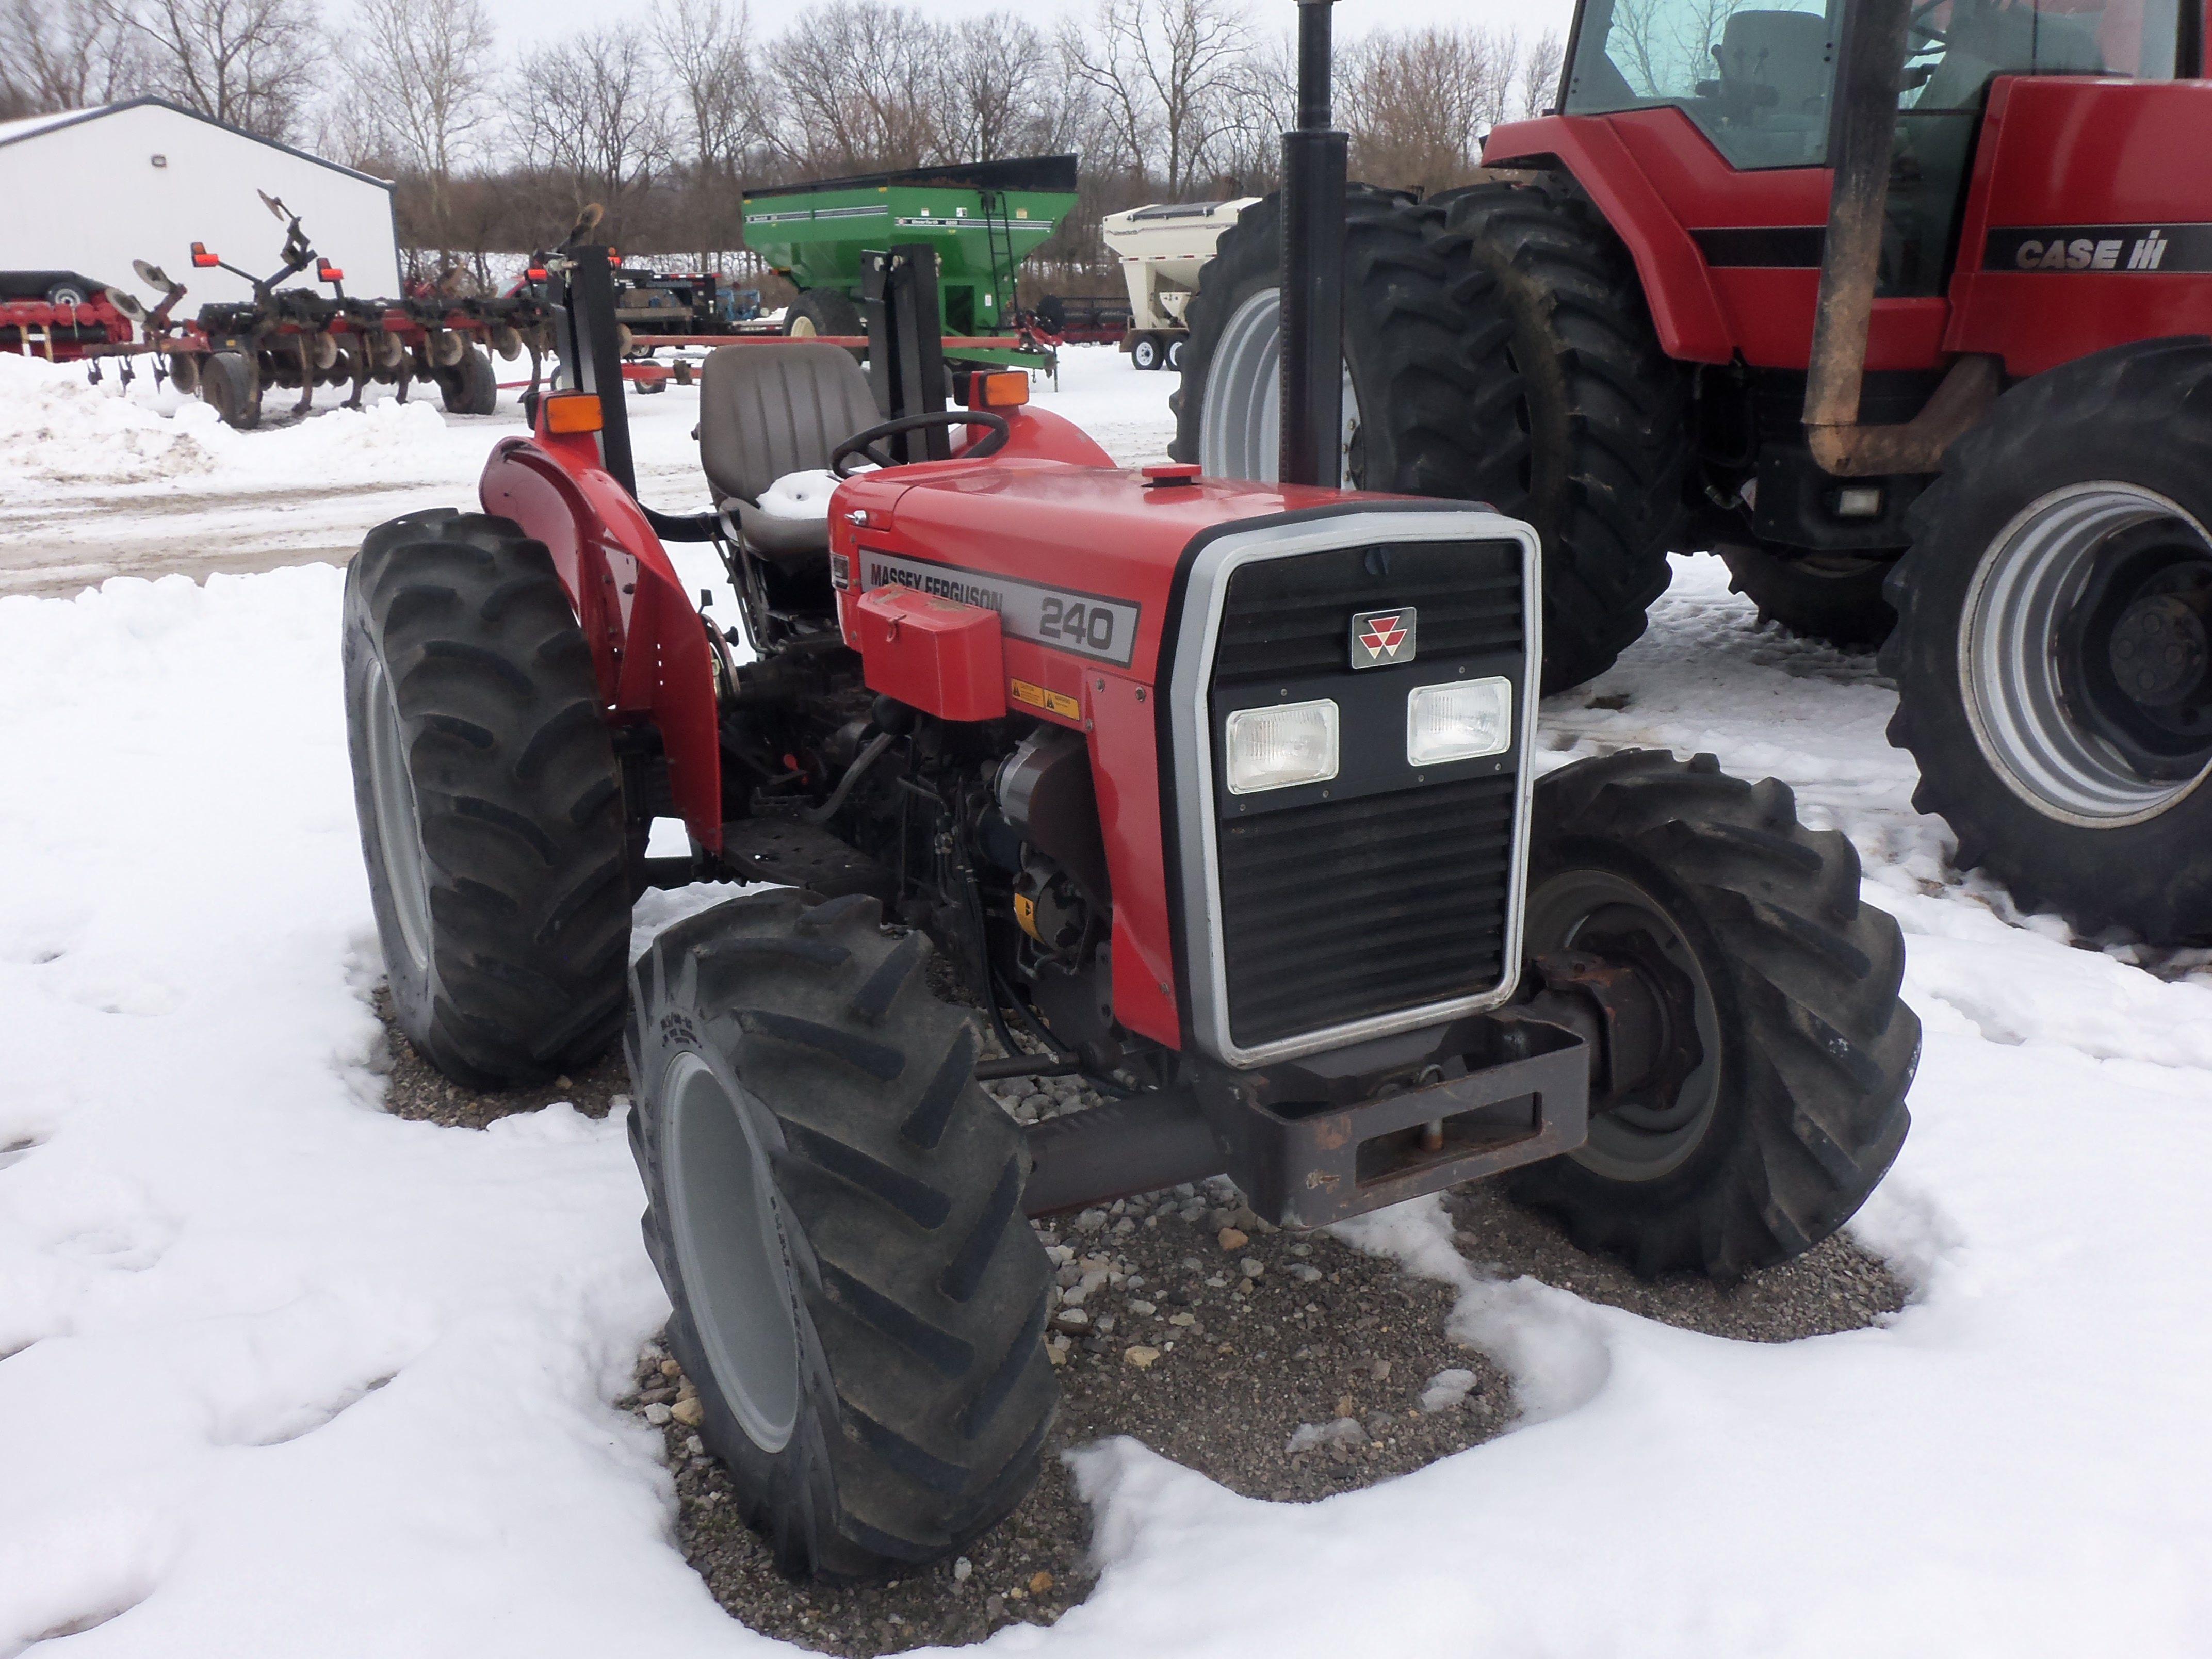 4 wheel drive Massey Ferguson 240.In the 1970s Massey Ferguson made a  230,235 & 245 utility tractors